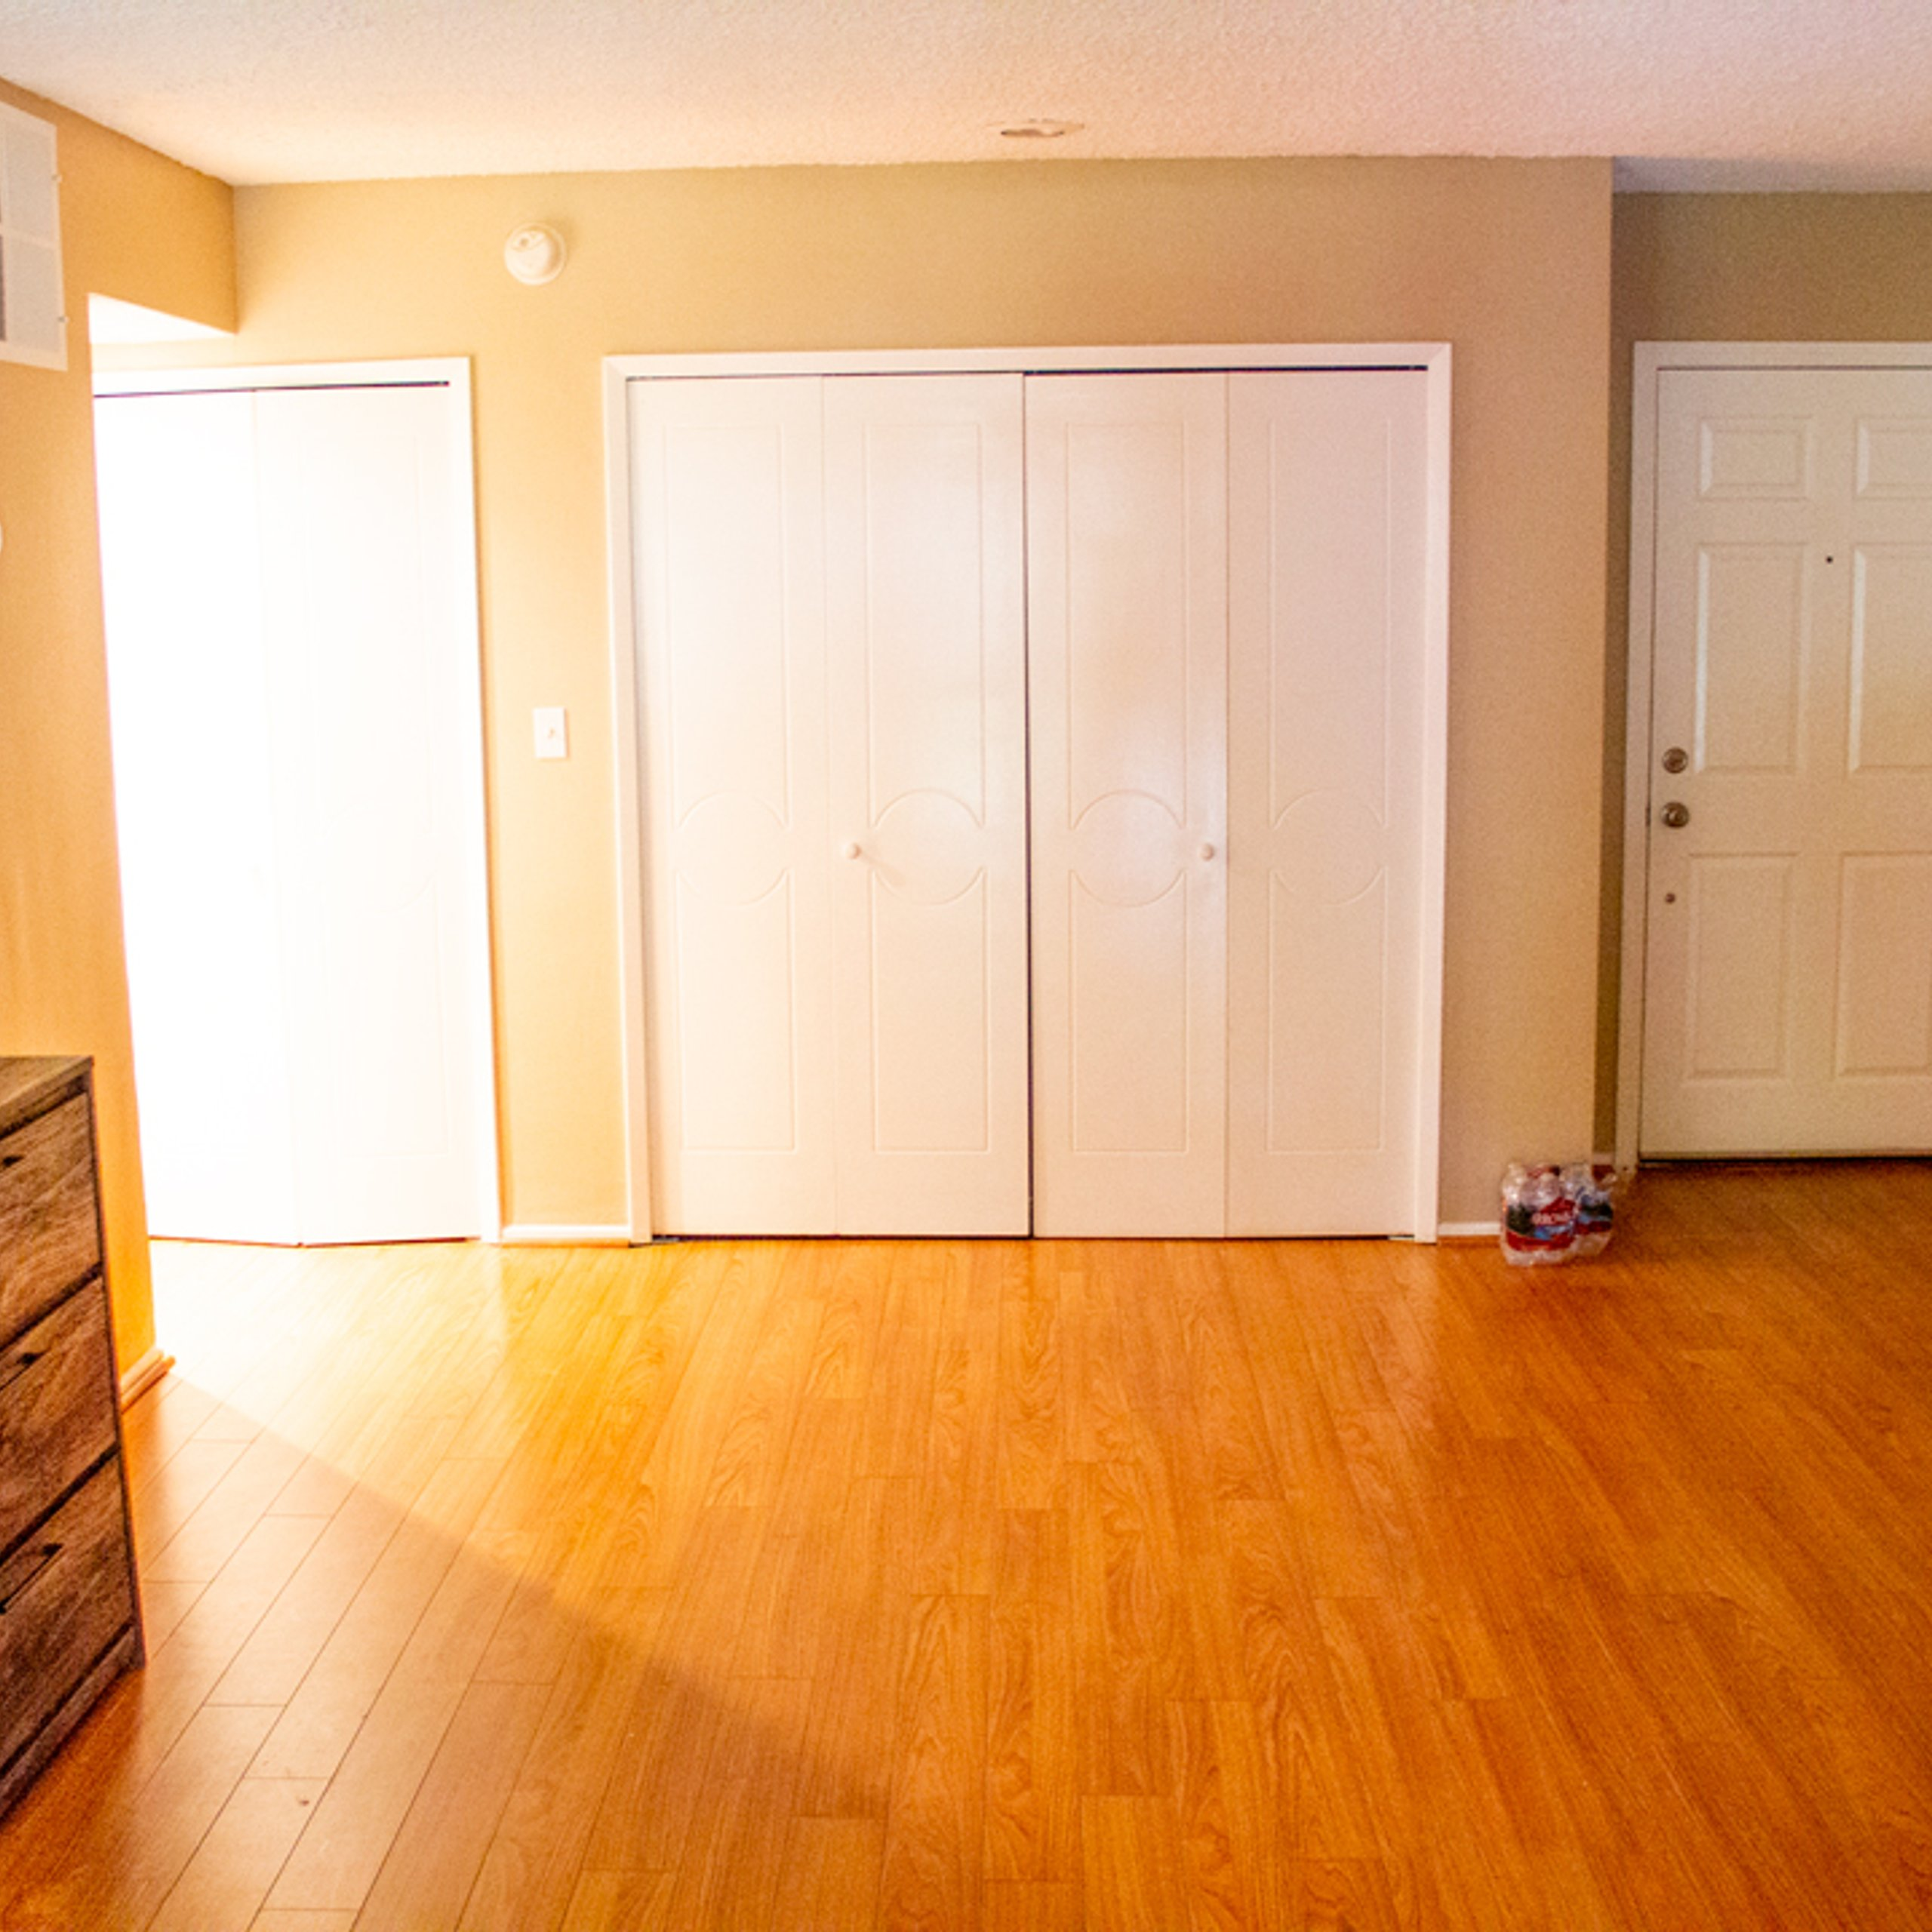 11x16 Bedroom self storage unit